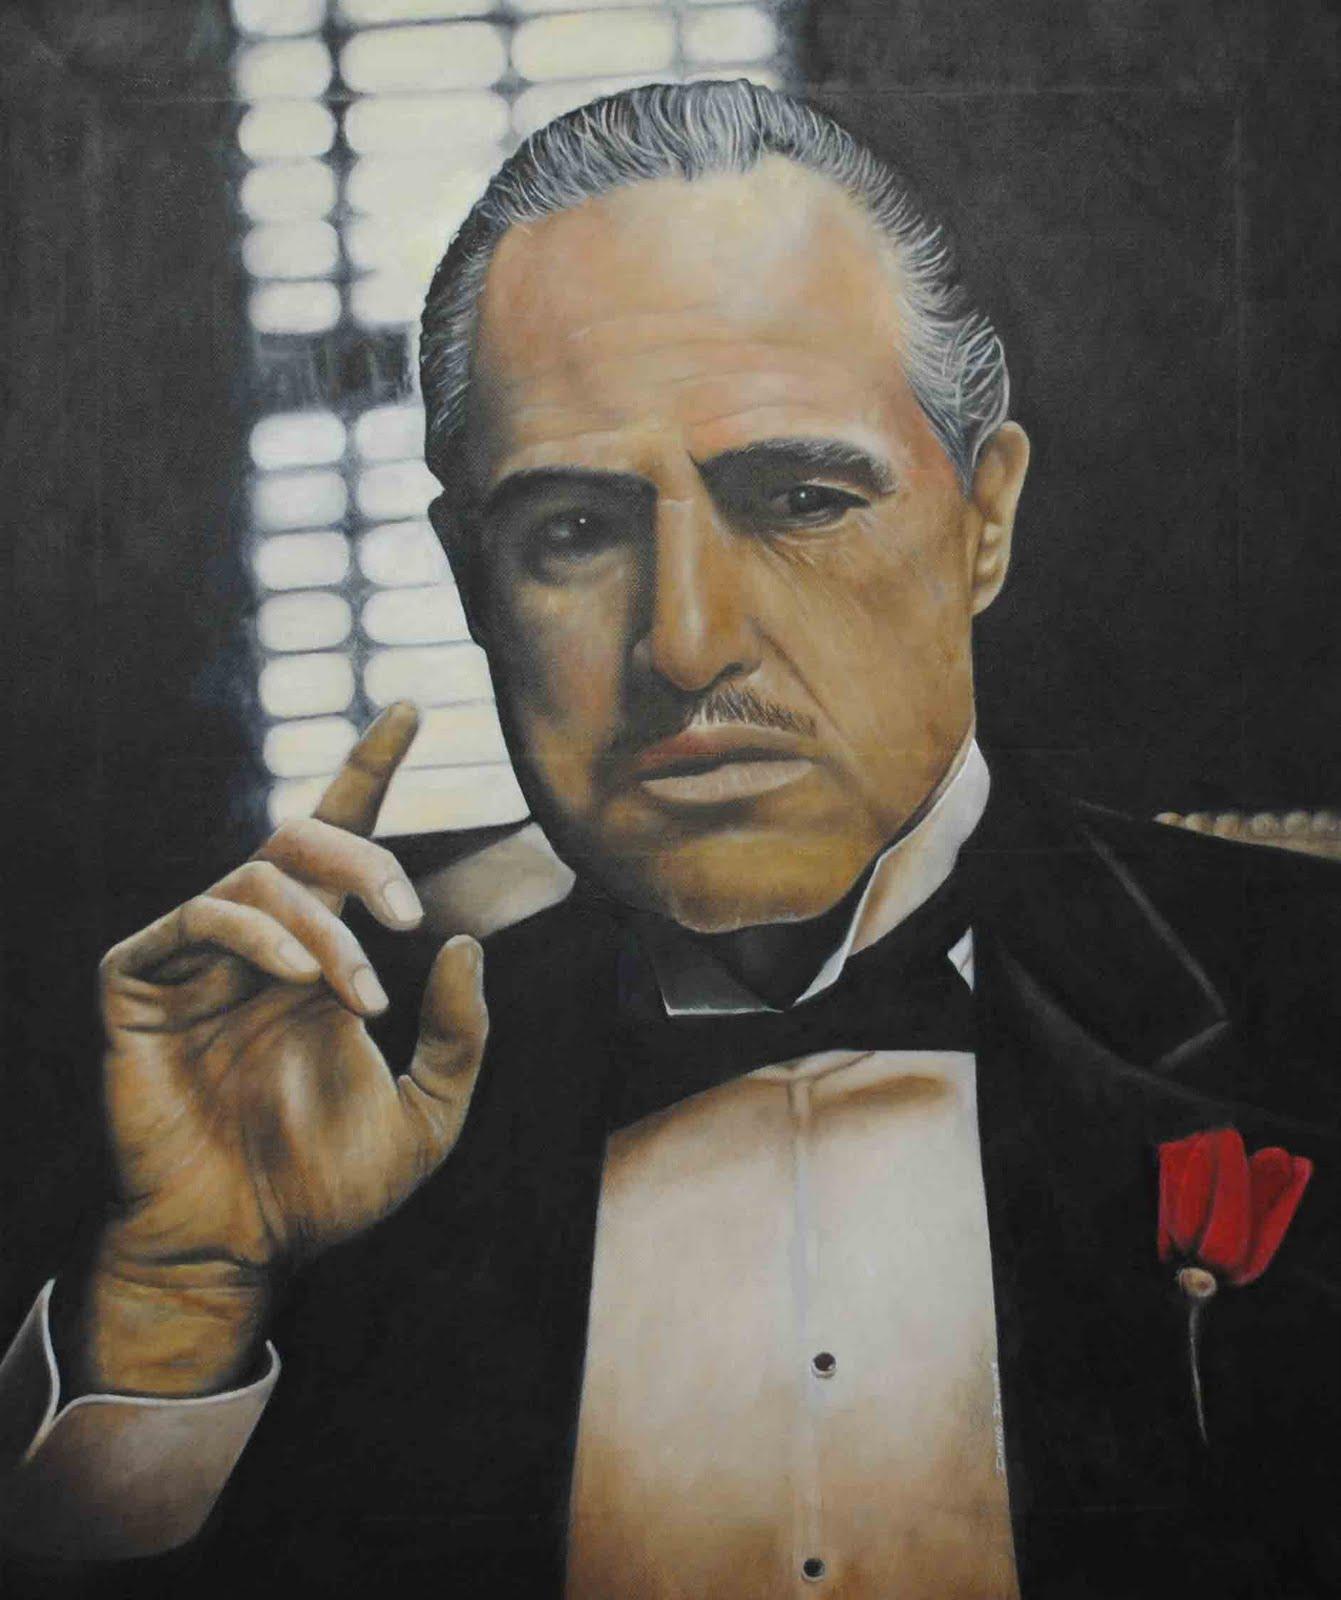 Italienische Mafia Filme